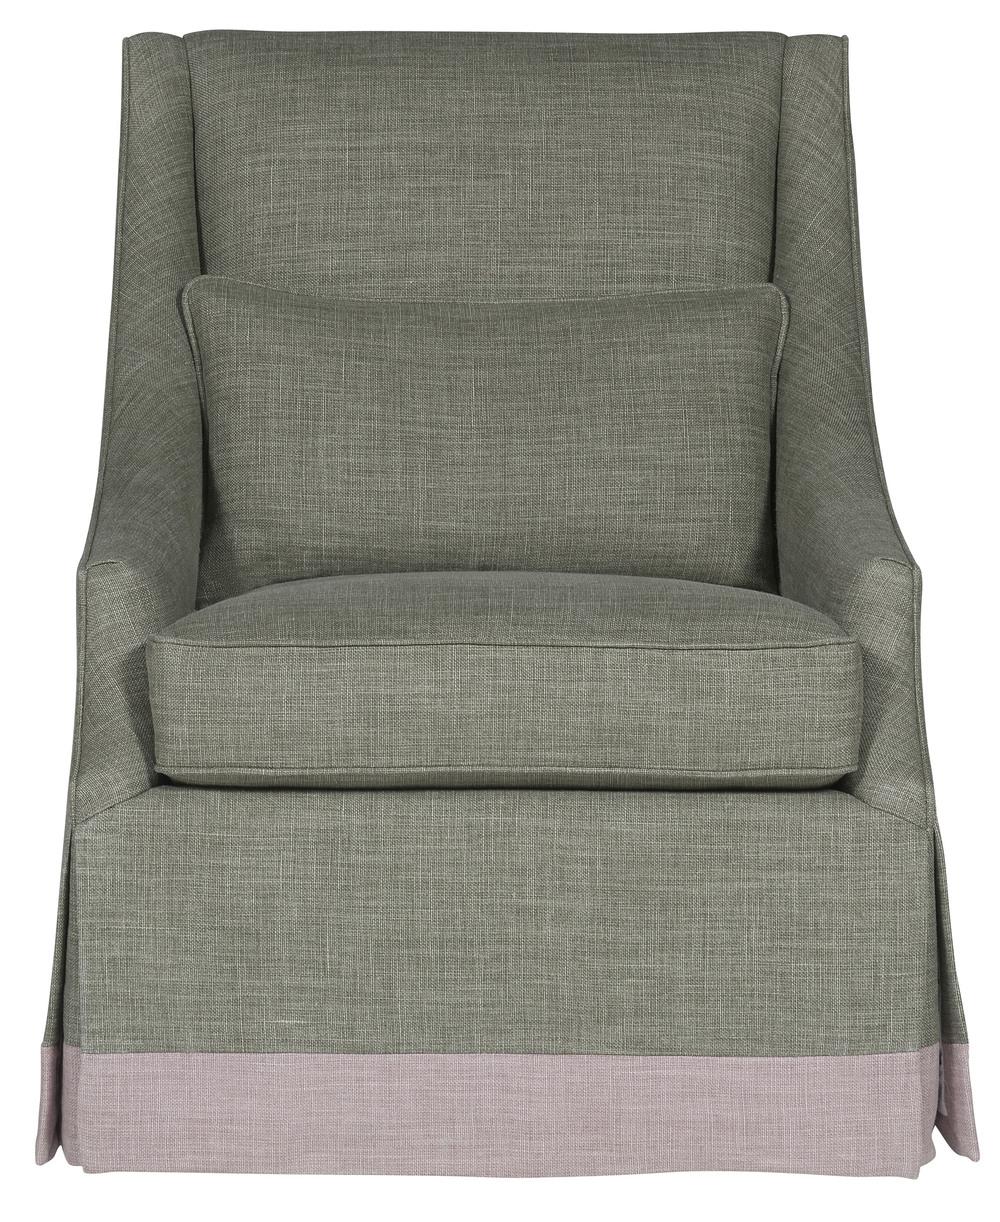 Vanguard Furniture - Boden Swivel Chair